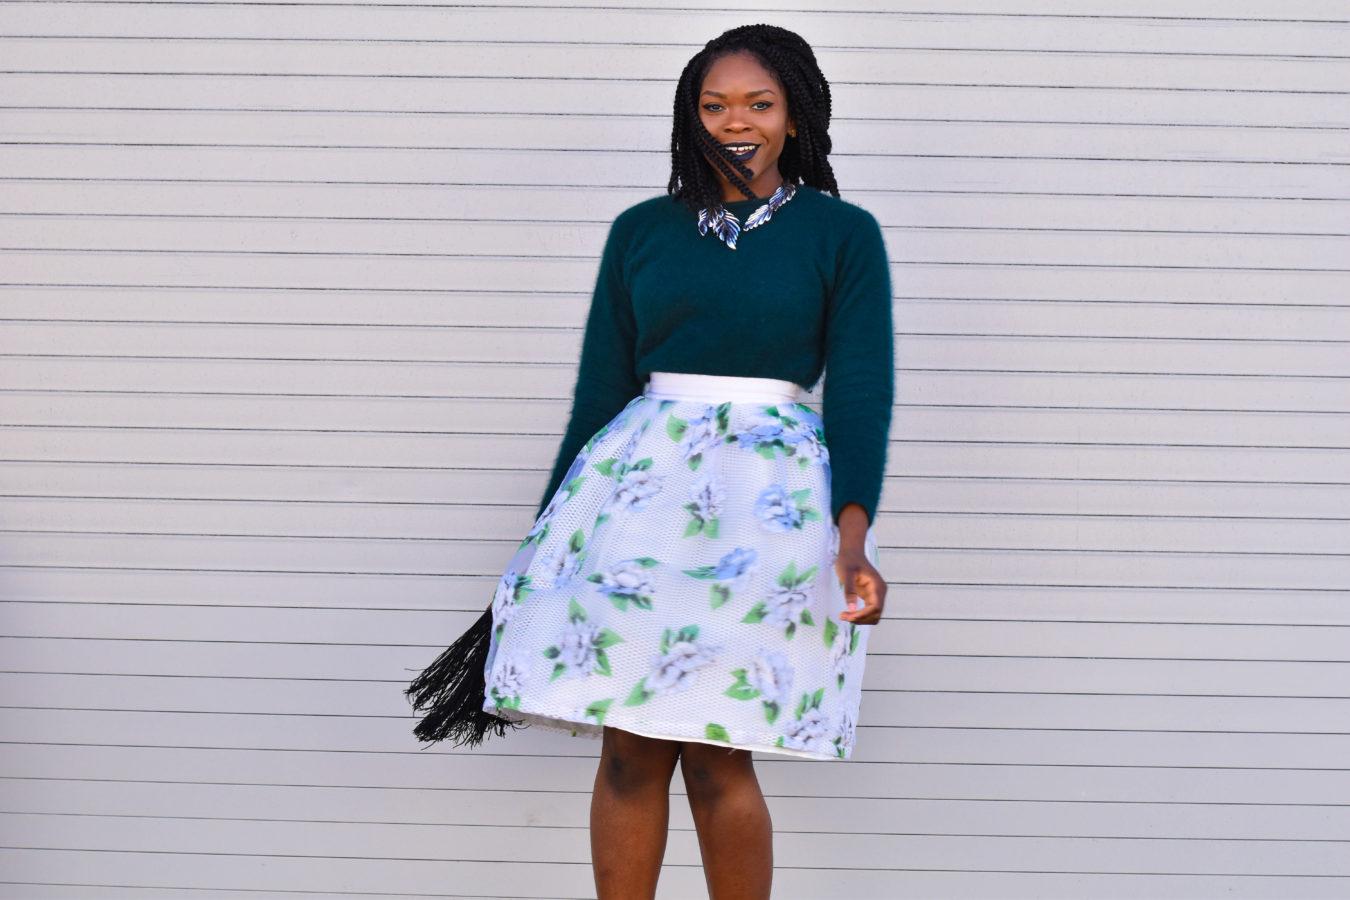 Befitting Style Oyinkan Wearing Full Skirt Fuzzy Sweater NYFW 1